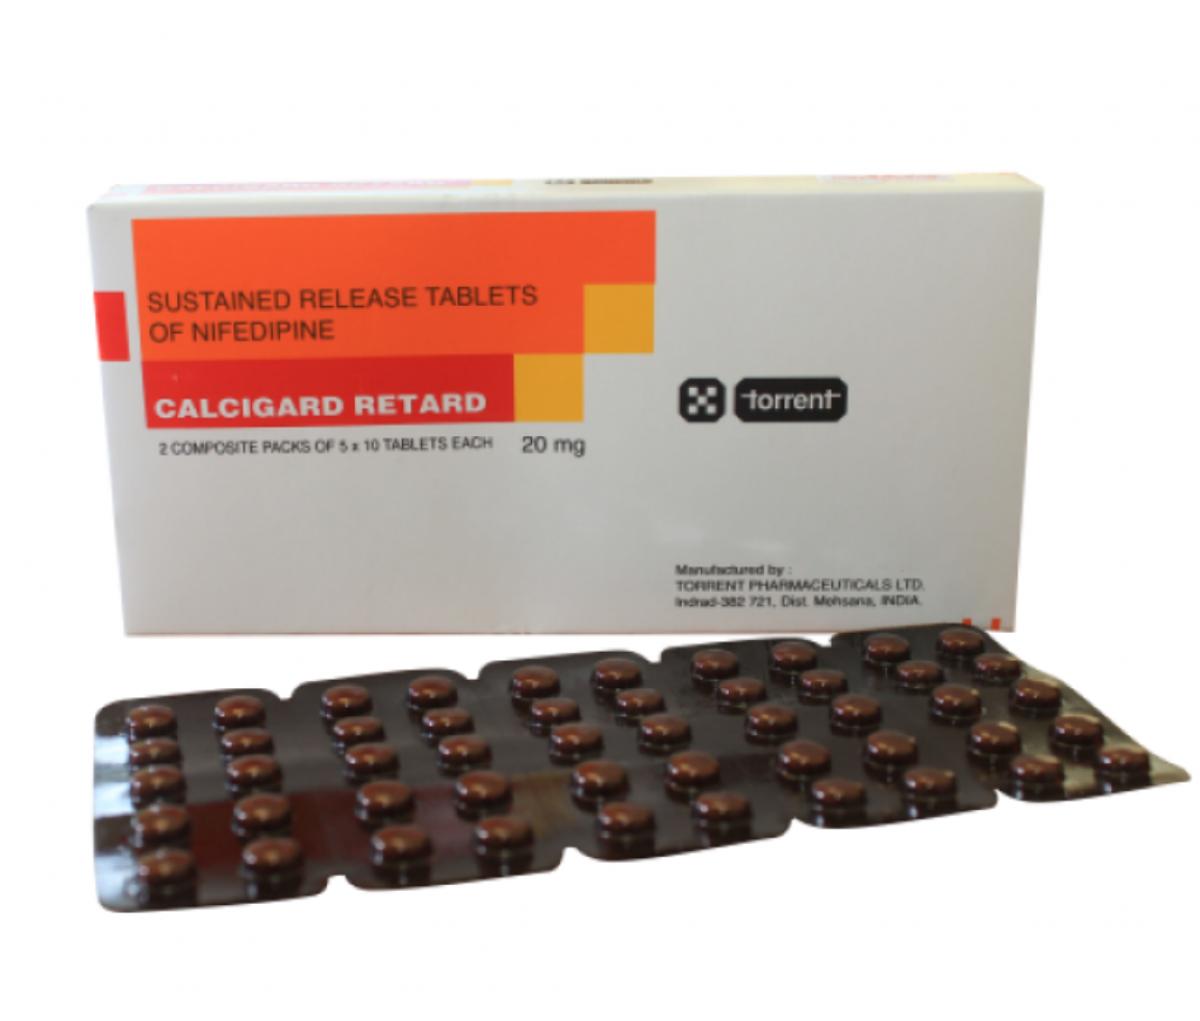 Calcigard Retard 20mg BP Tablet